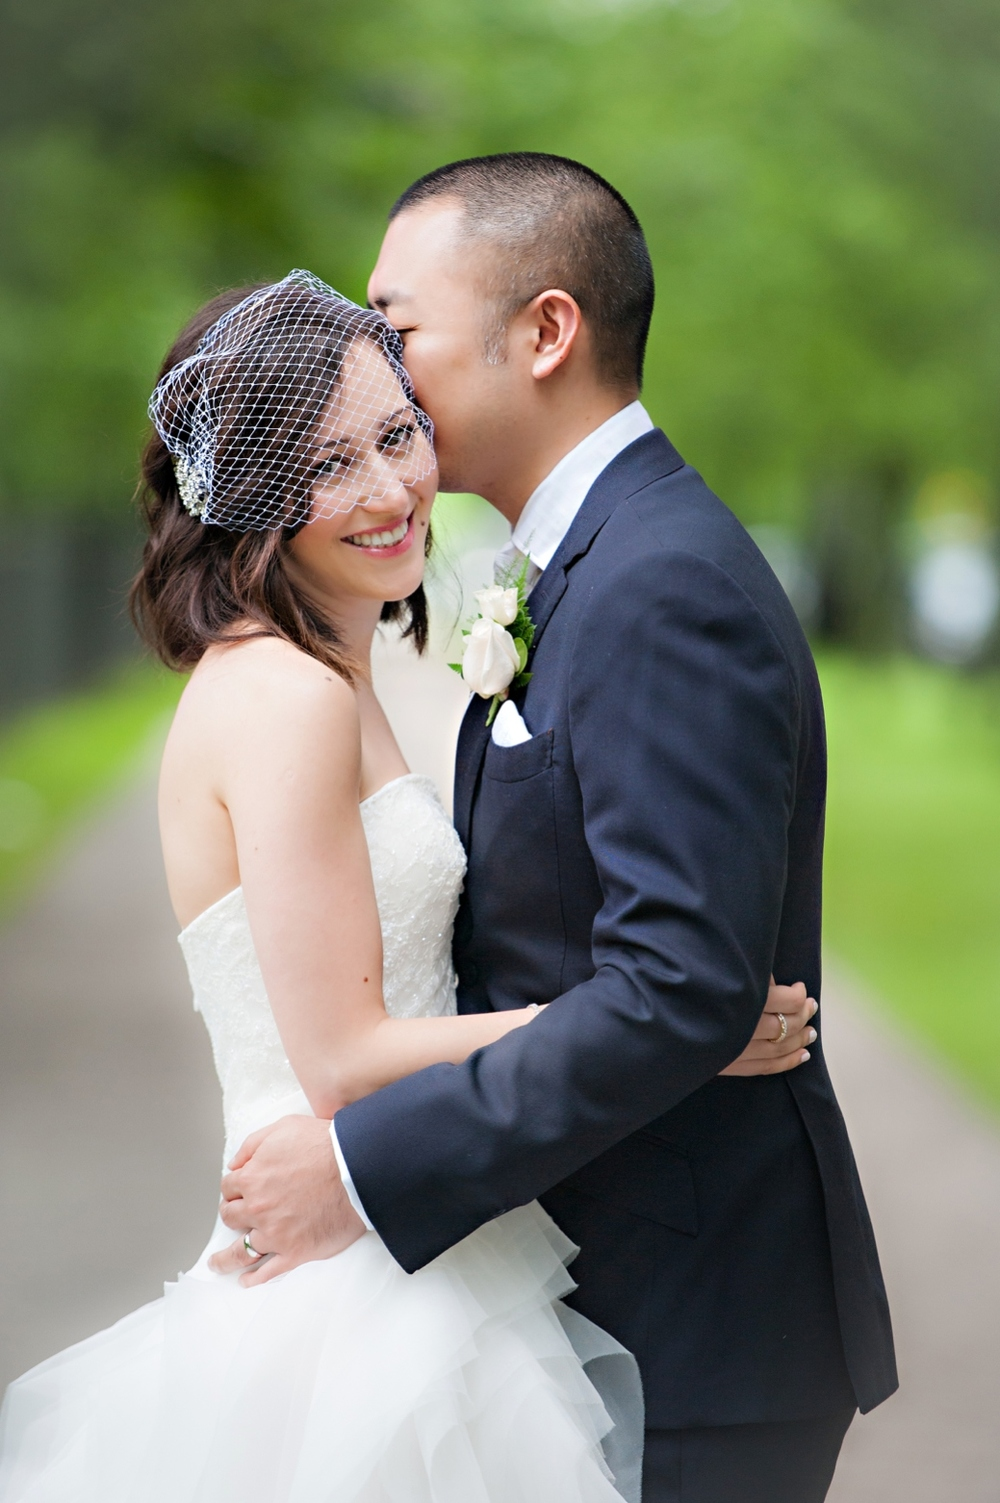 Lord-Nelson-Halifax-Wedding036.jpg